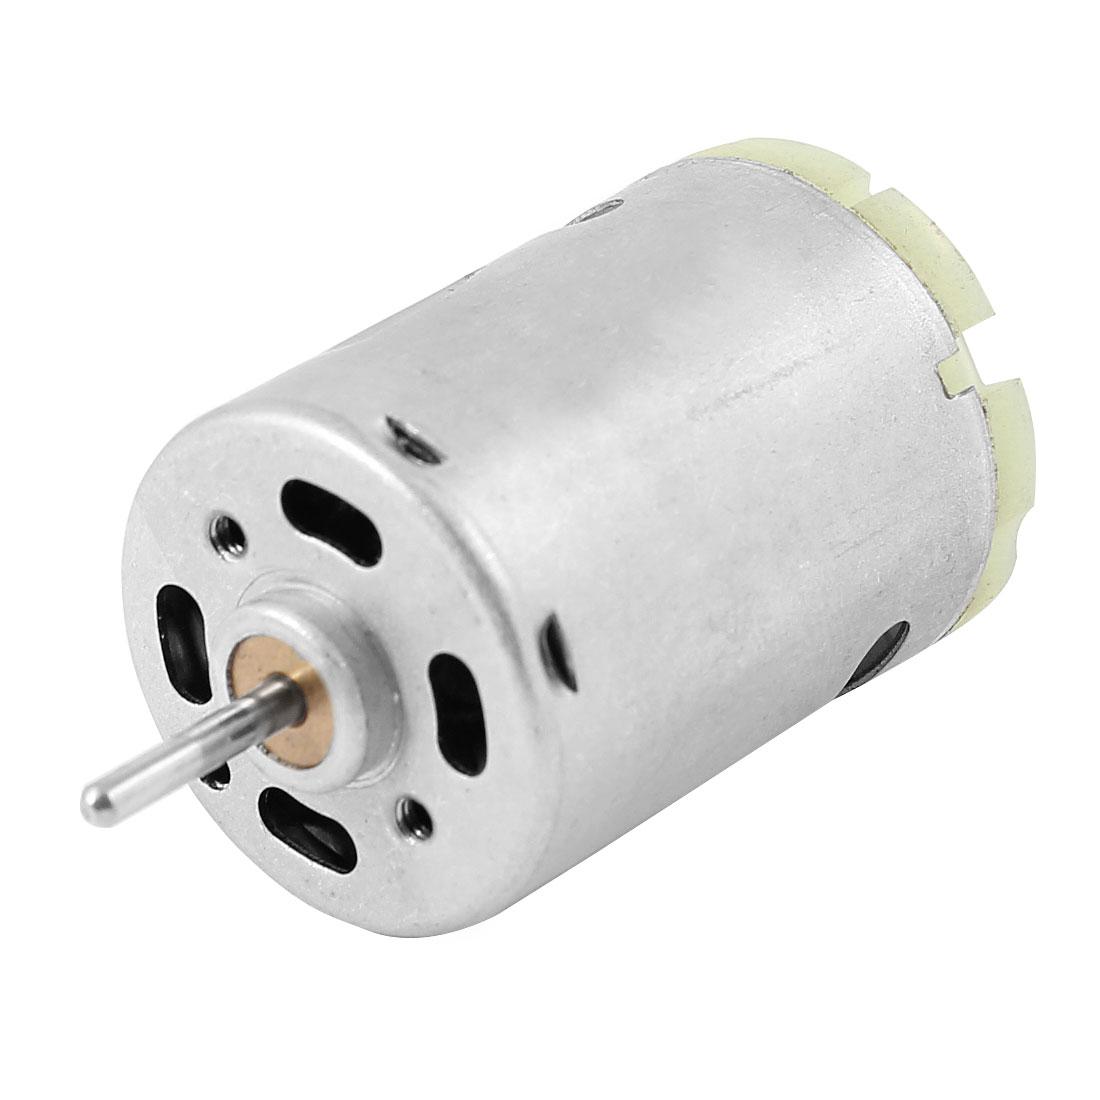 13200RPM Rotary Speed Cylinder Shape Vibration DC Motor 24V